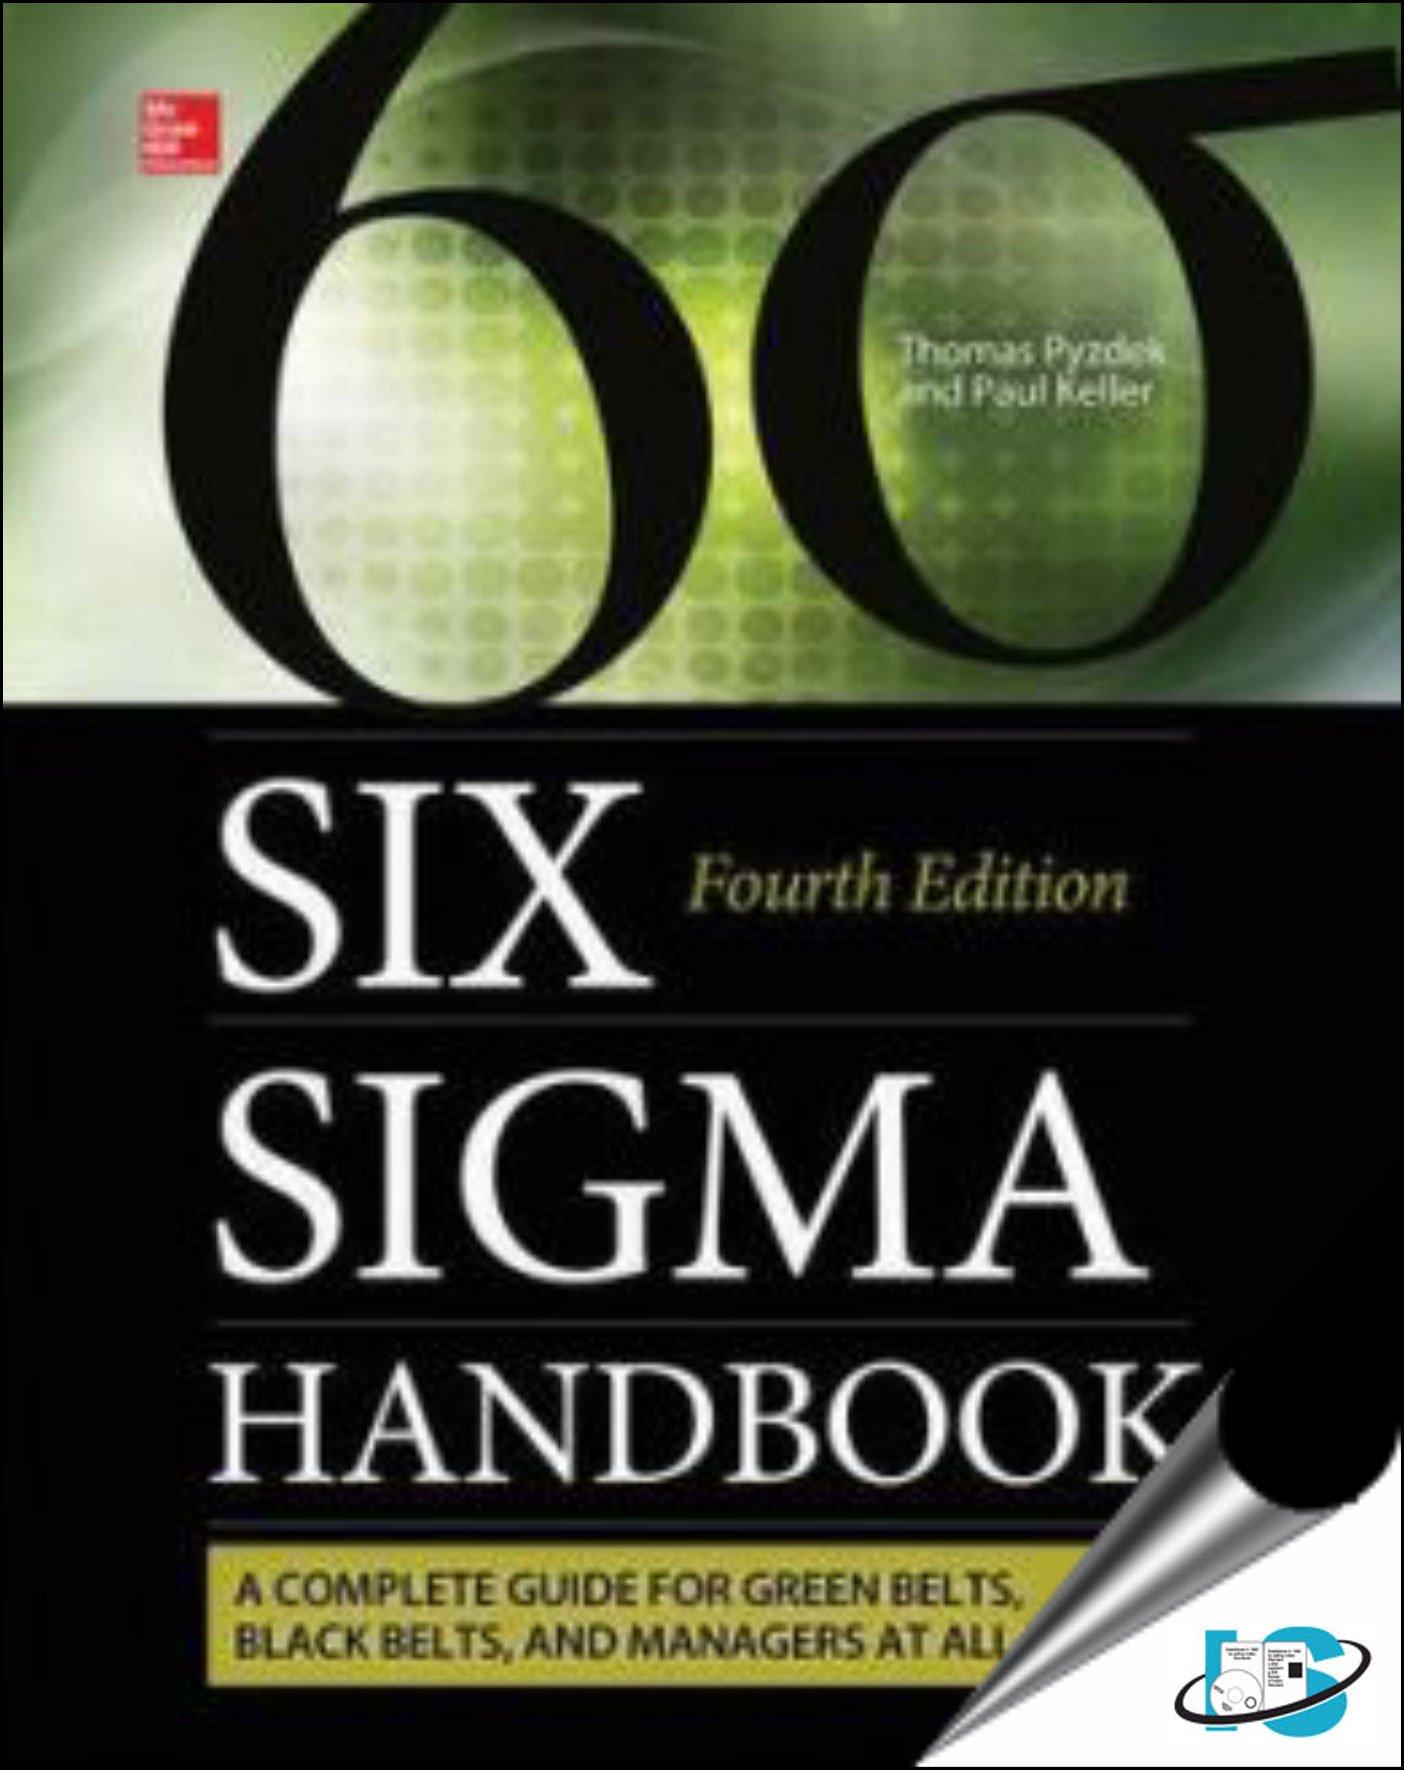 Six sigma handbook hardcover 2015 0 international edition six sigma handbook hardcover 2015 0 international edition pyzdek keller 9789339221775 amazon books xflitez Image collections